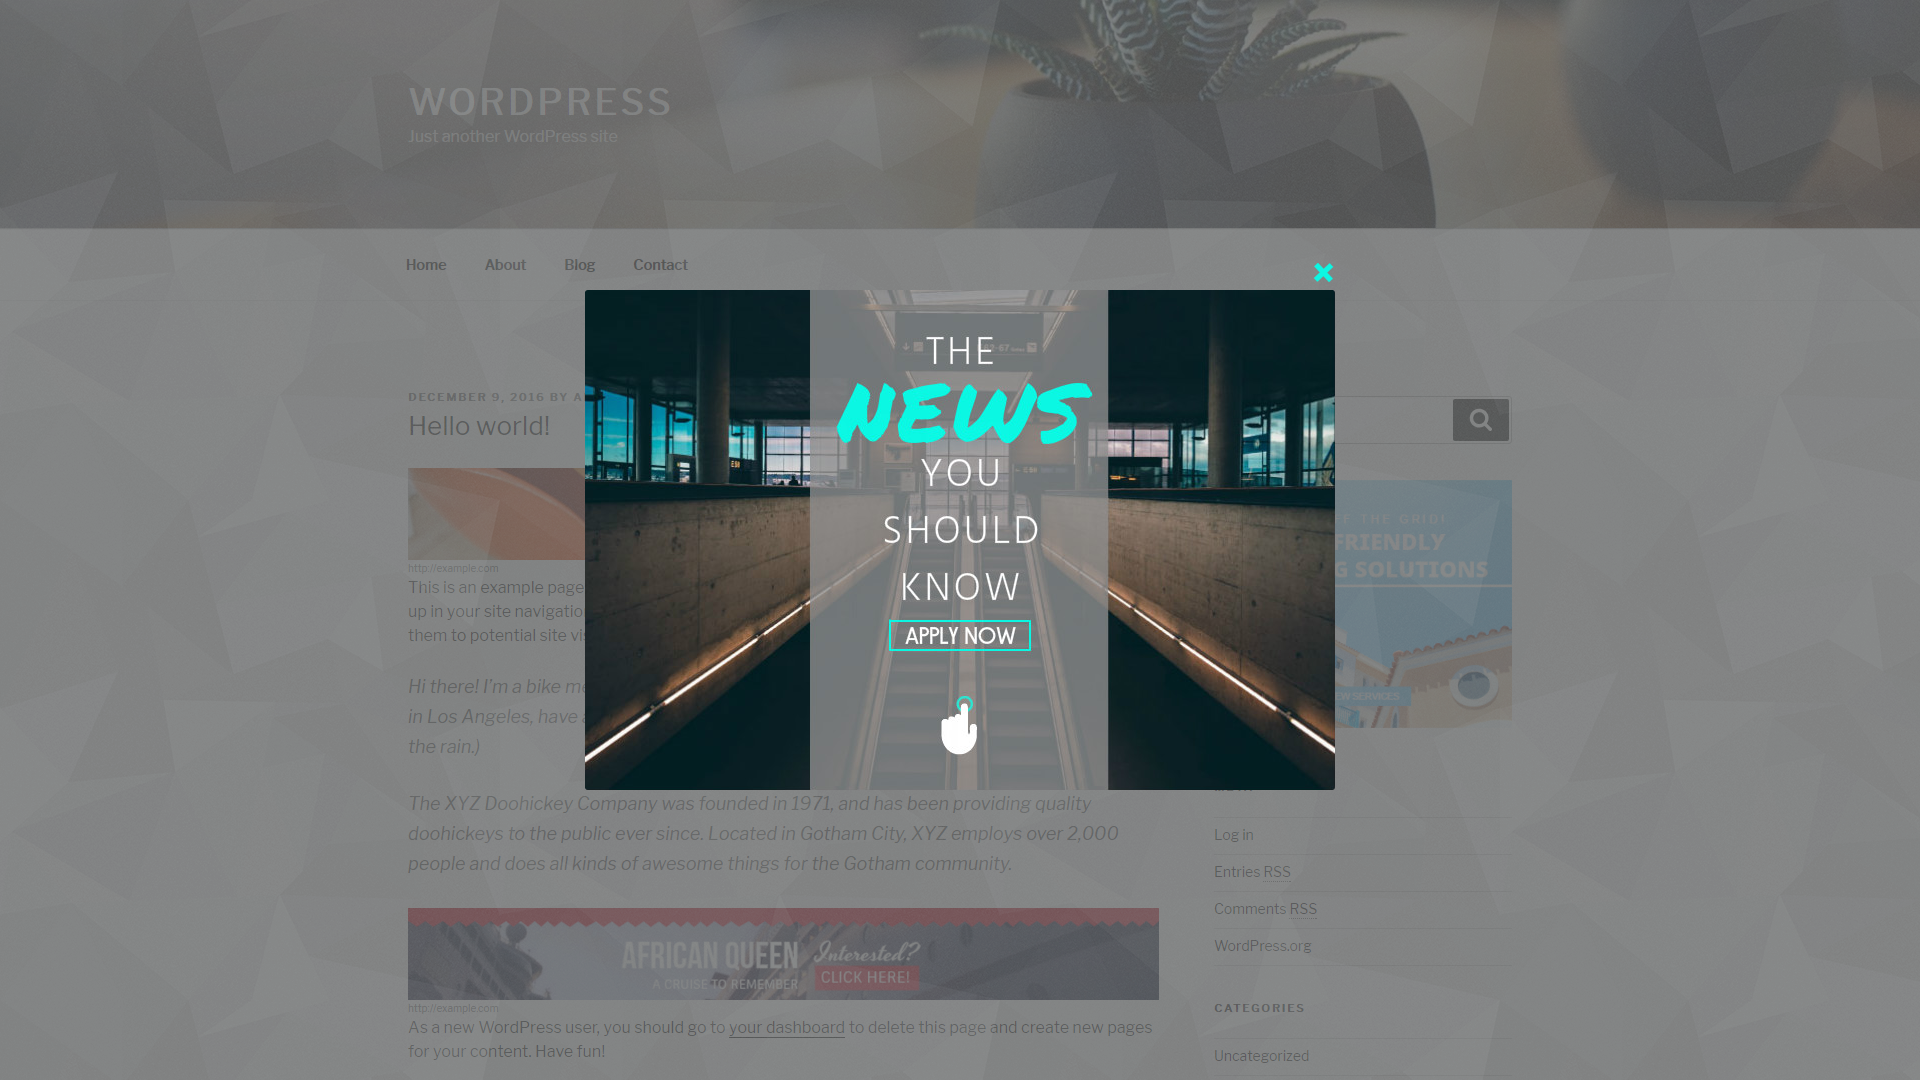 Aparg SmartAd - WordPress Ad Management Plugin by Aparg ...